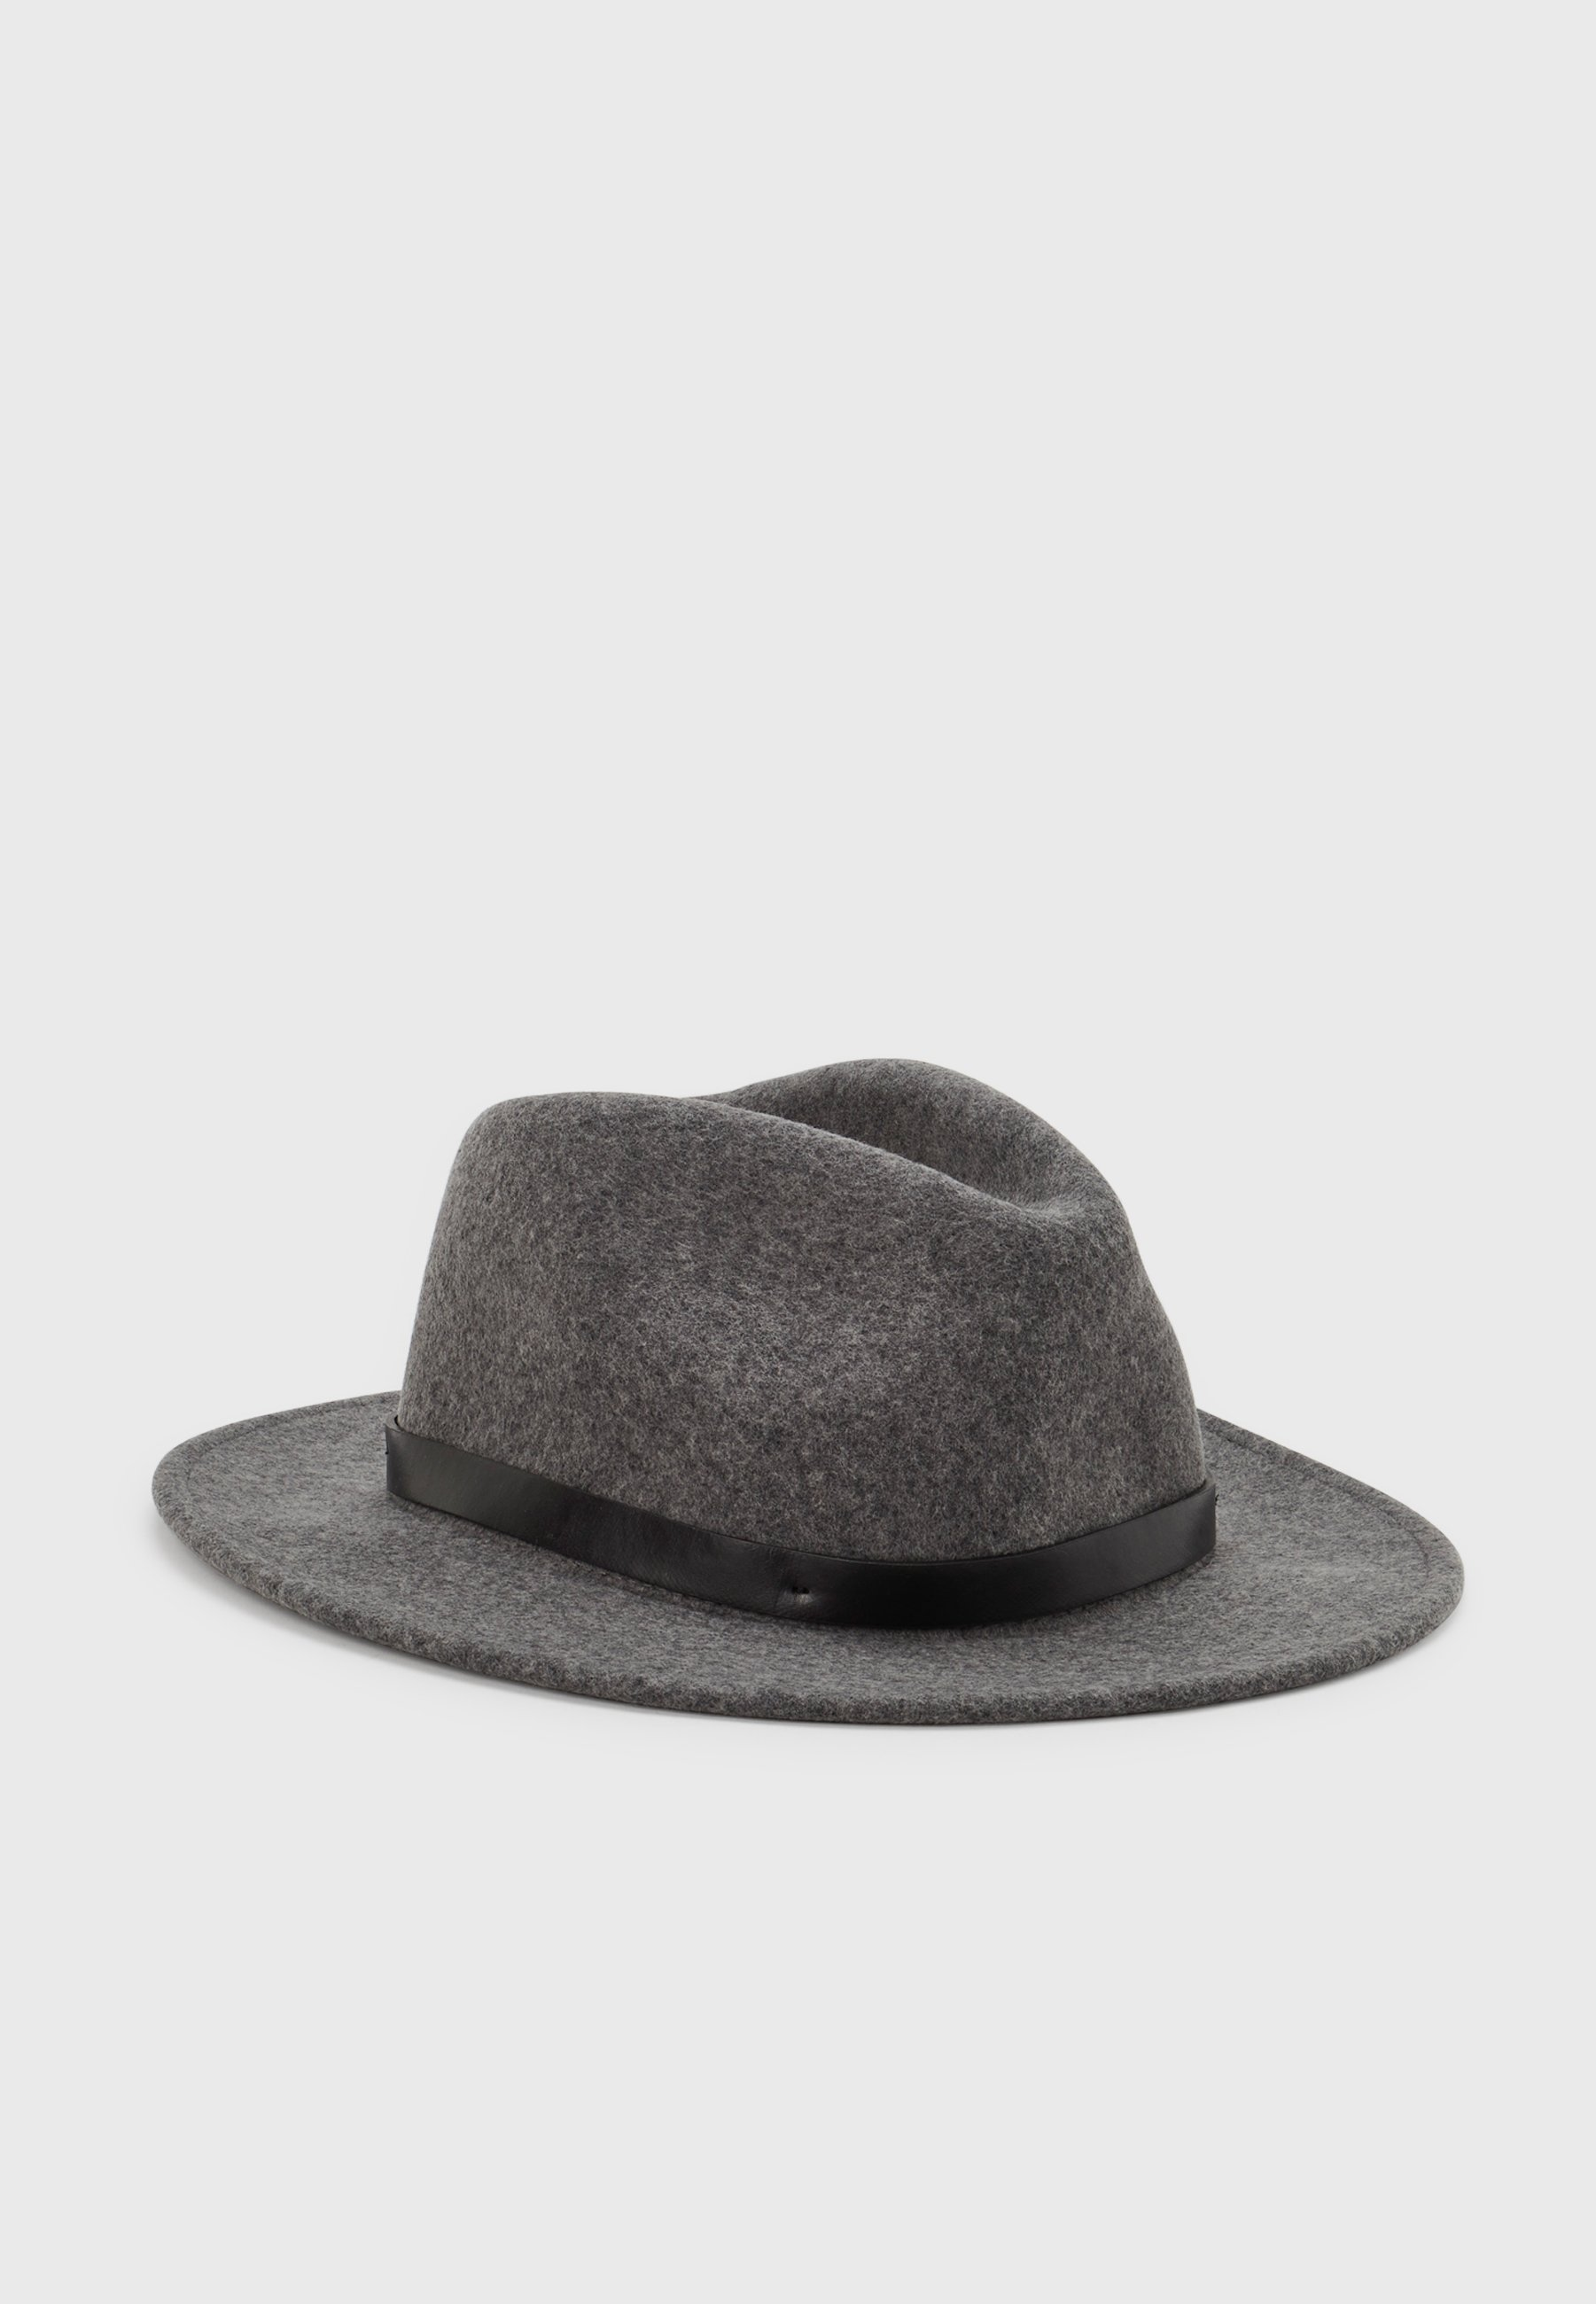 Homme MESSER FEDORA UNISEX - Chapeau